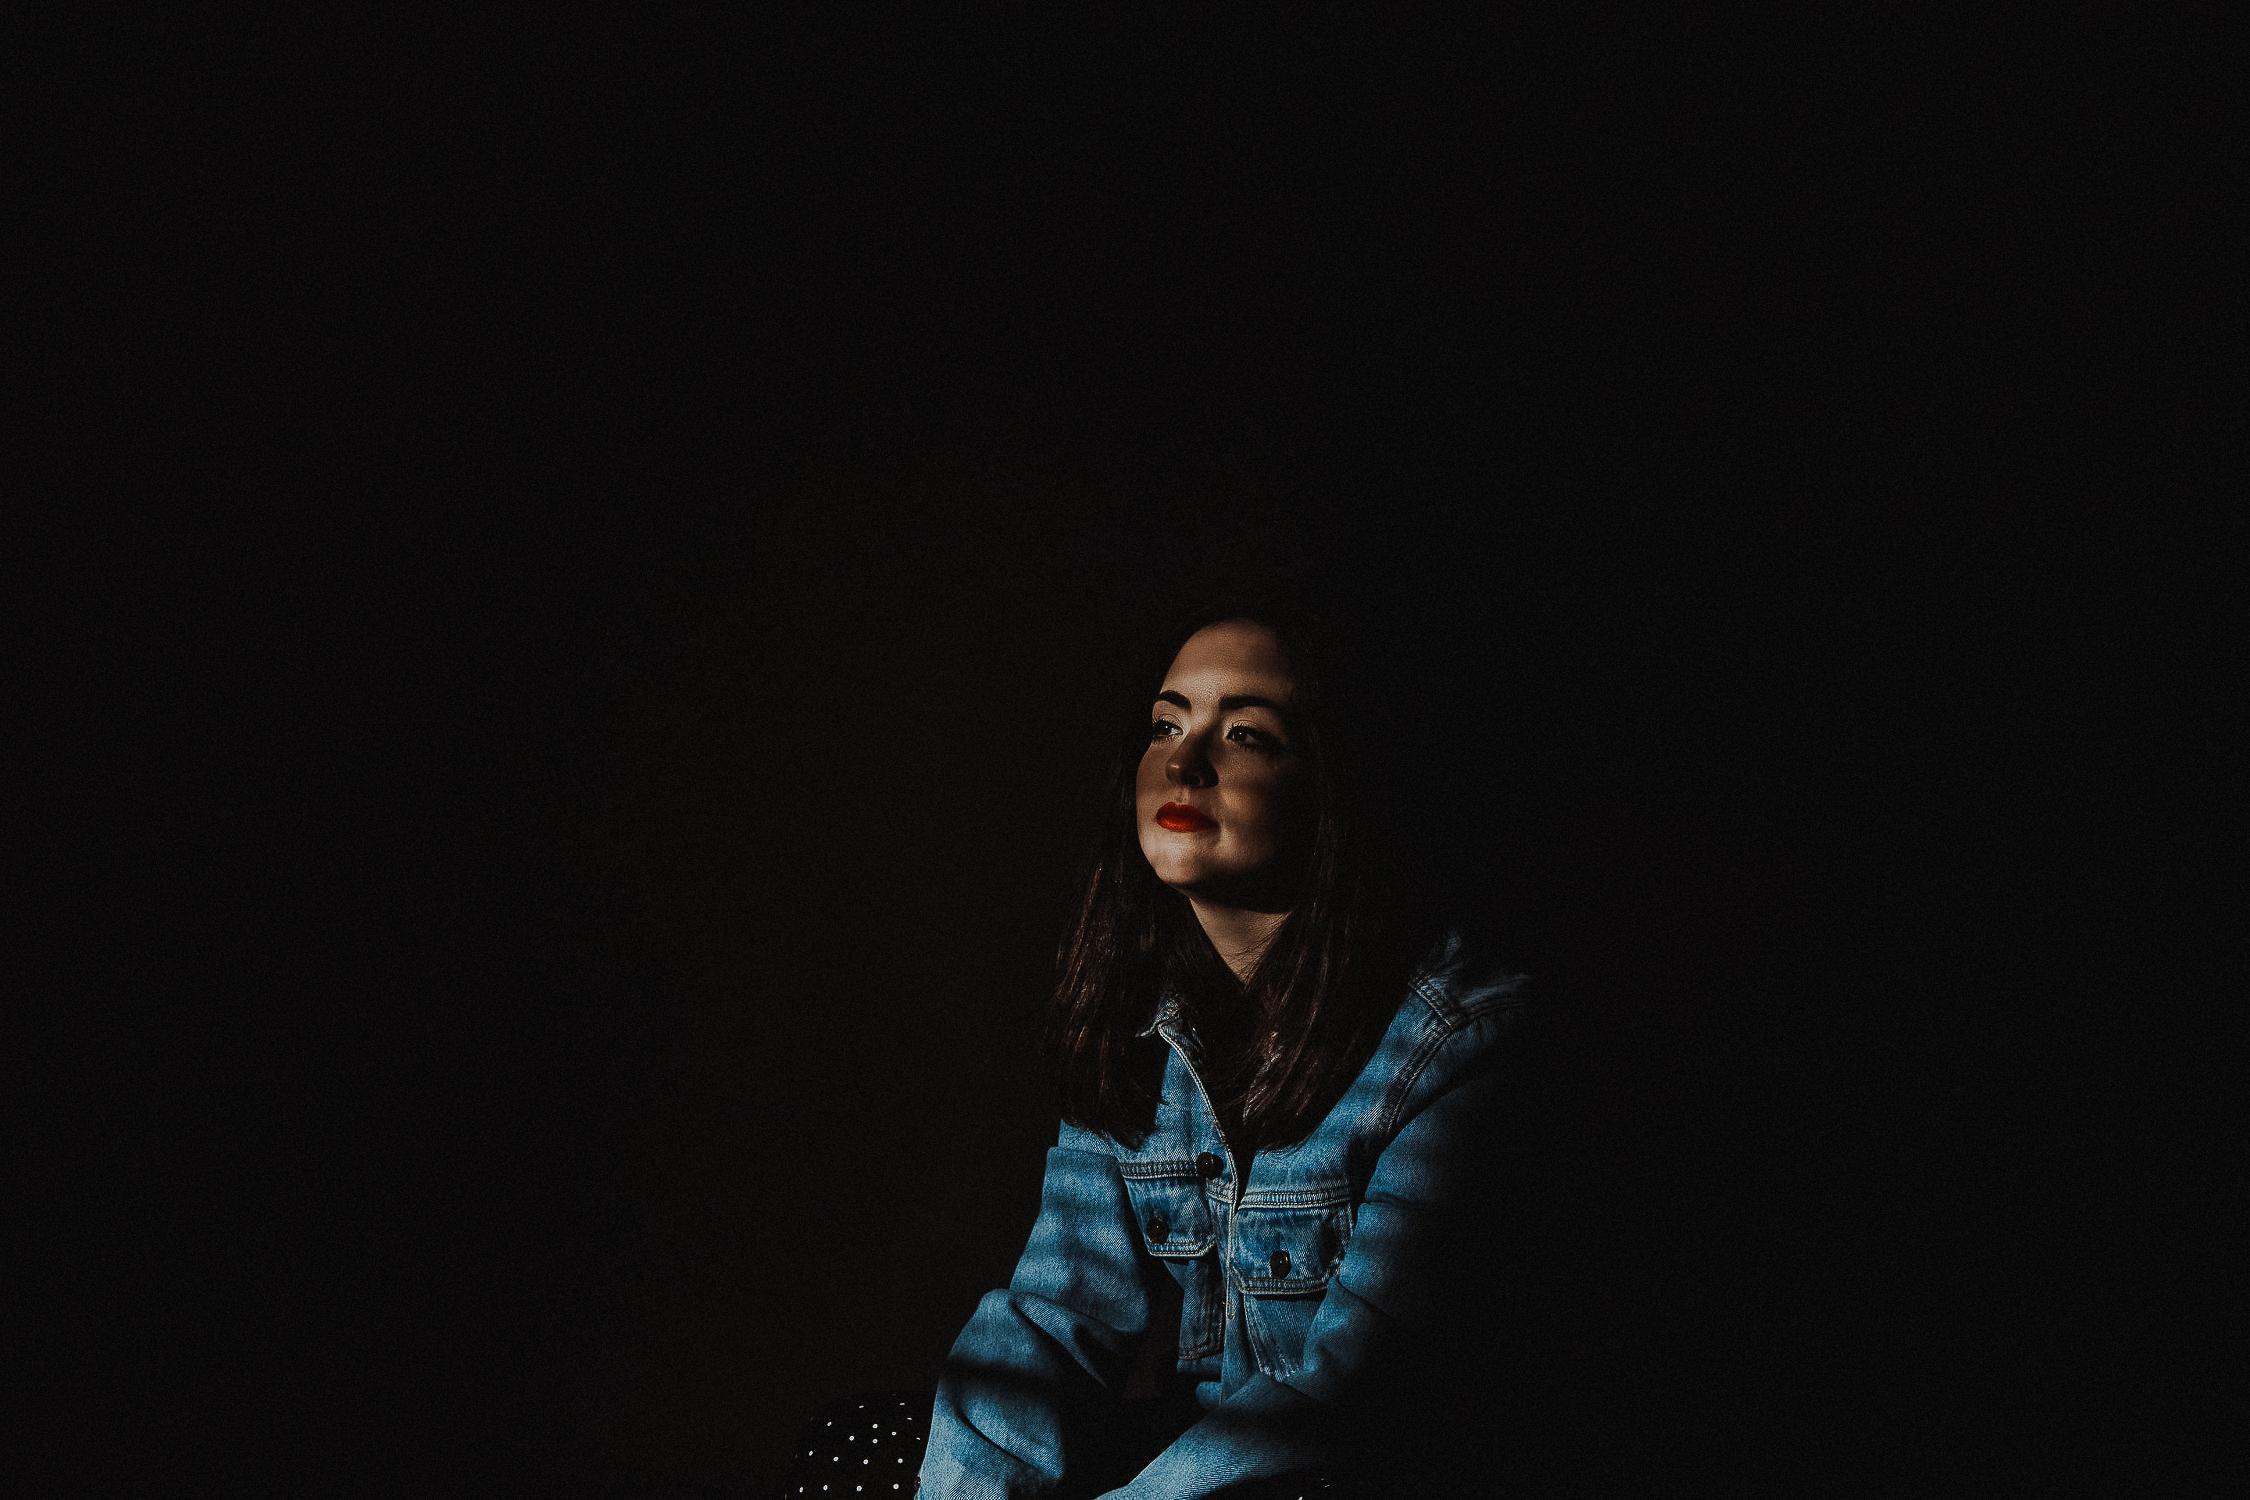 lifestyle-serenamorandi-portrait